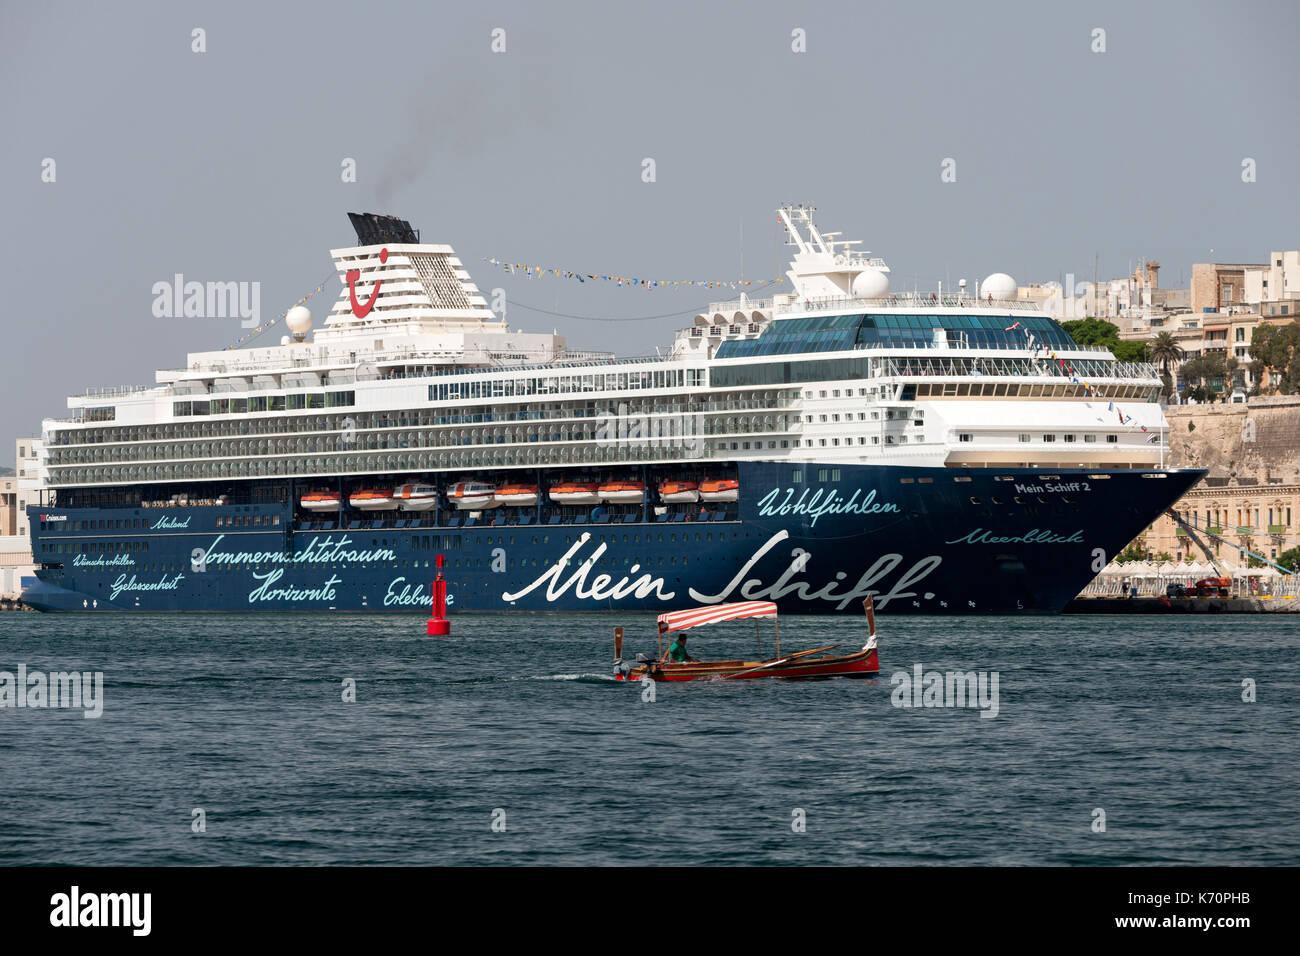 The Mein Schiff 5 cruise ship docked in Grand Harbour in Valletta, Malta. - Stock Image